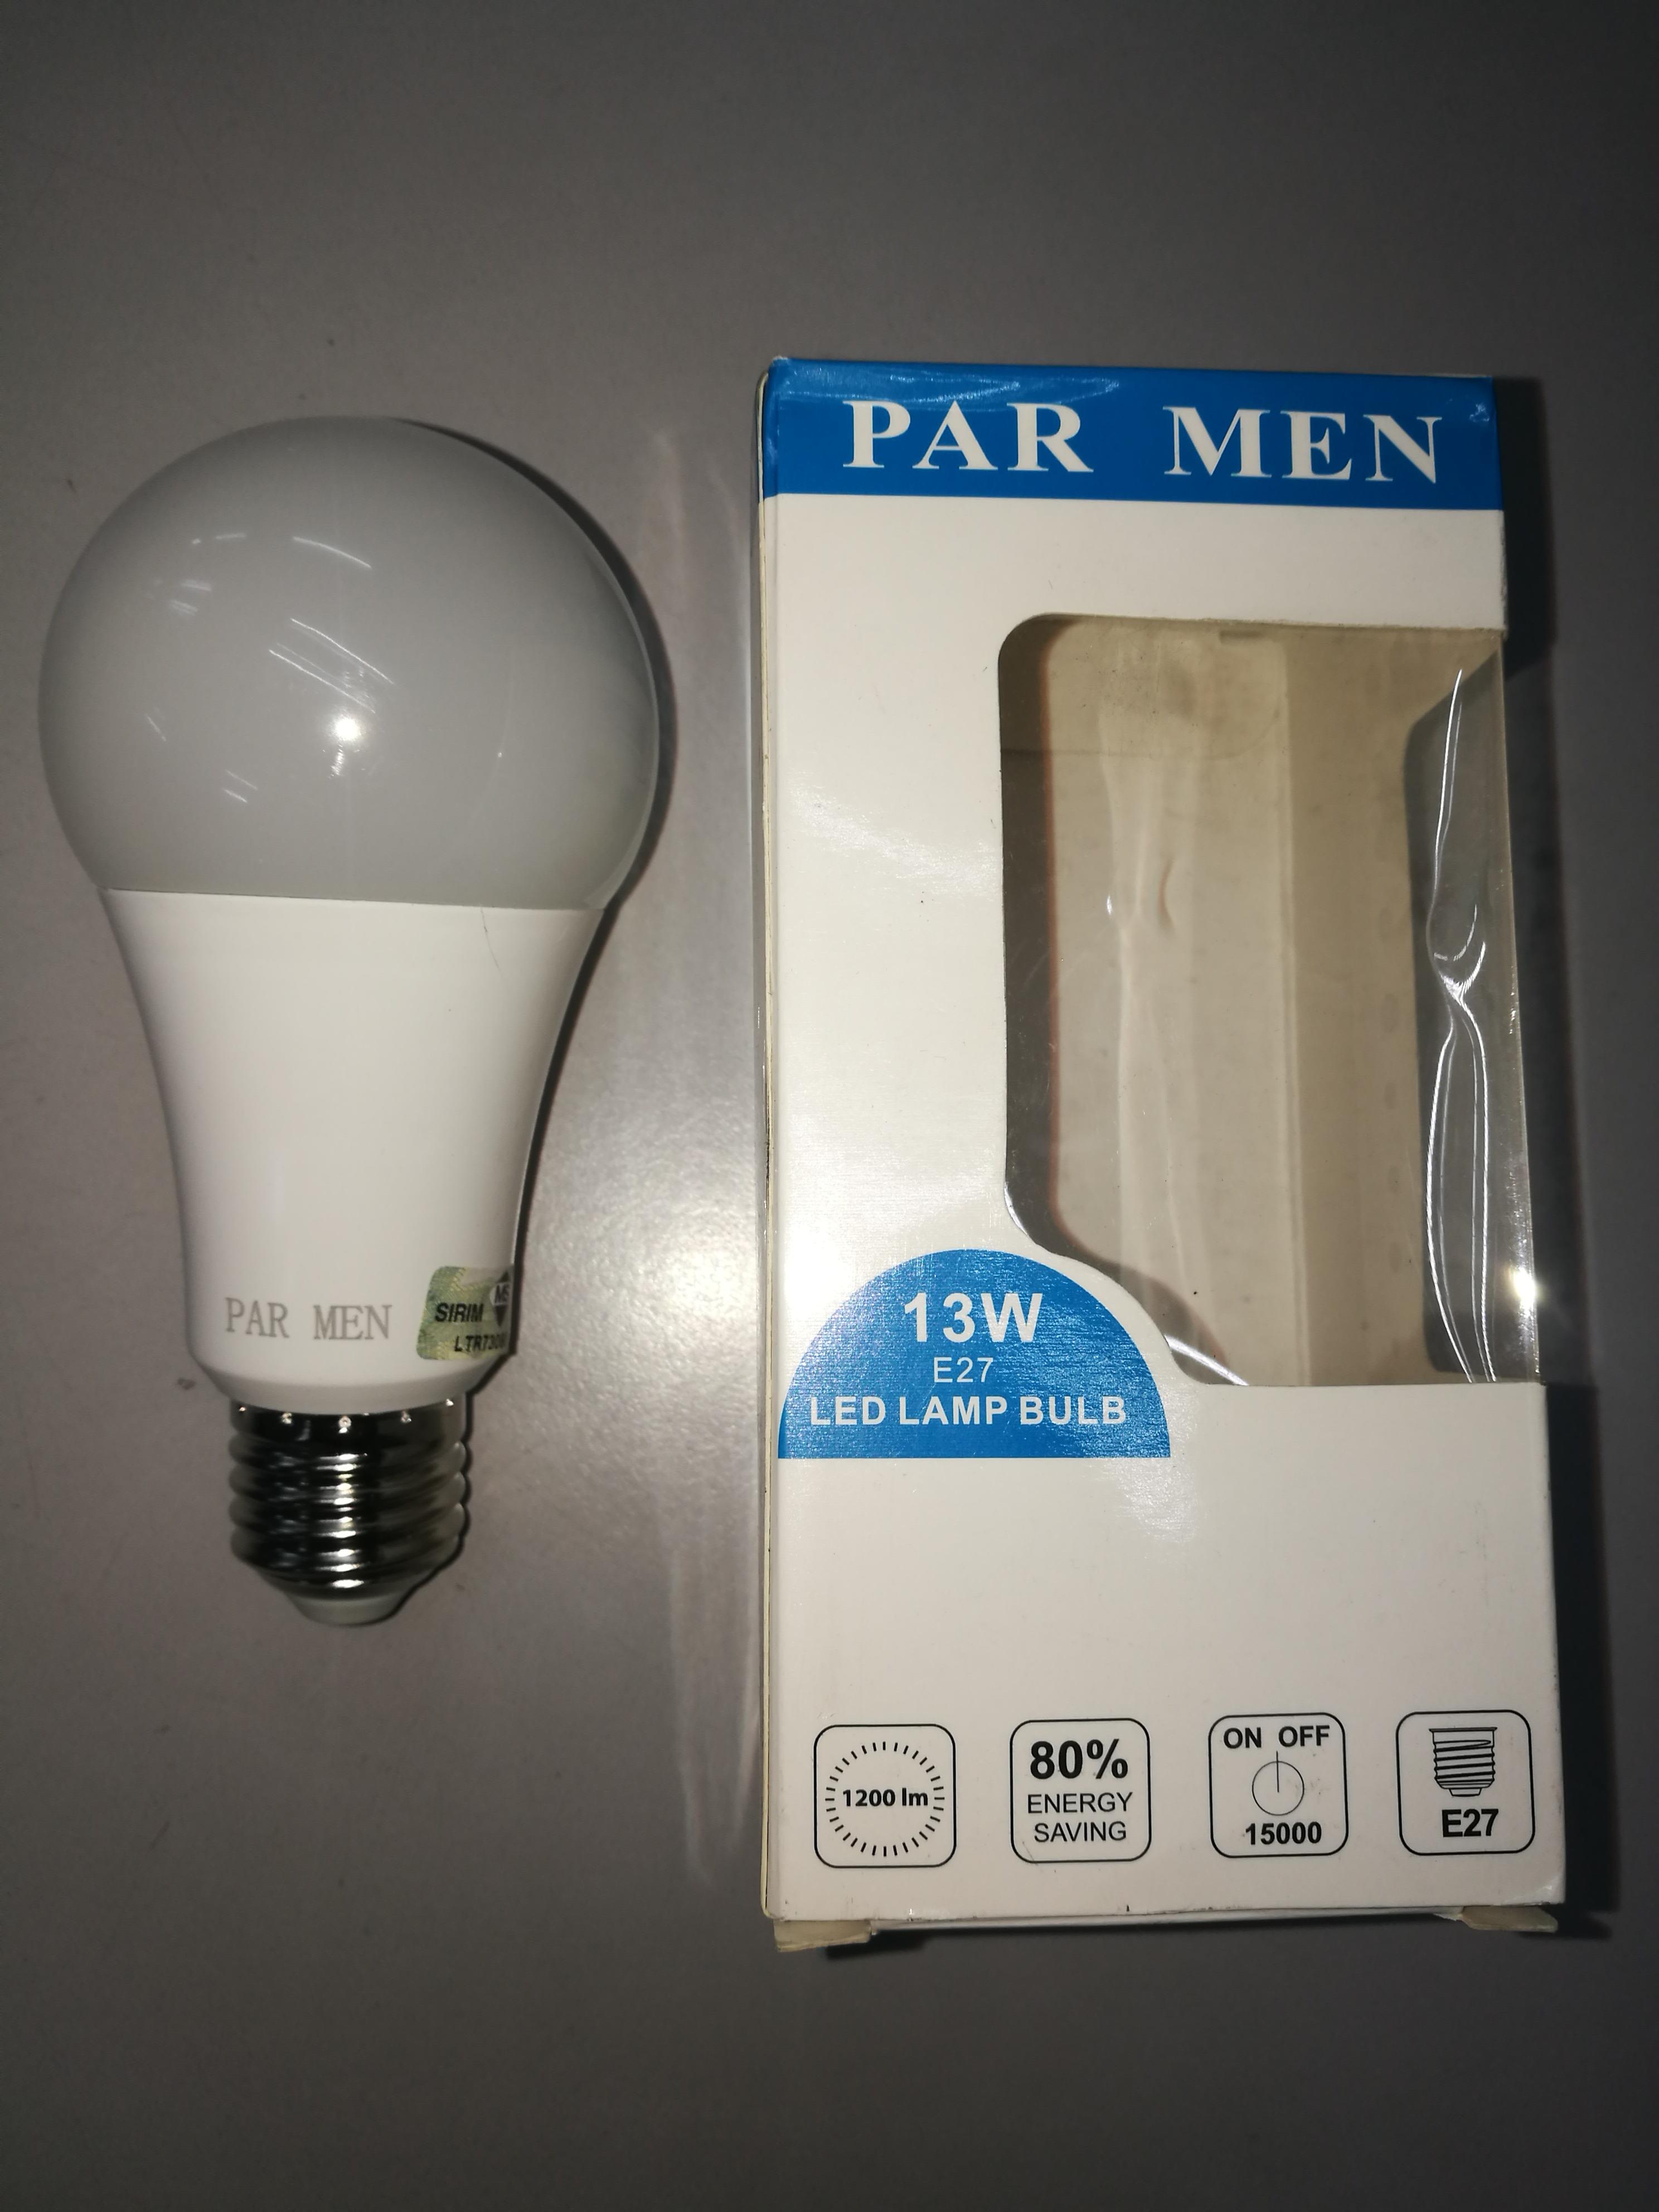 Par Men 13wn led bulb